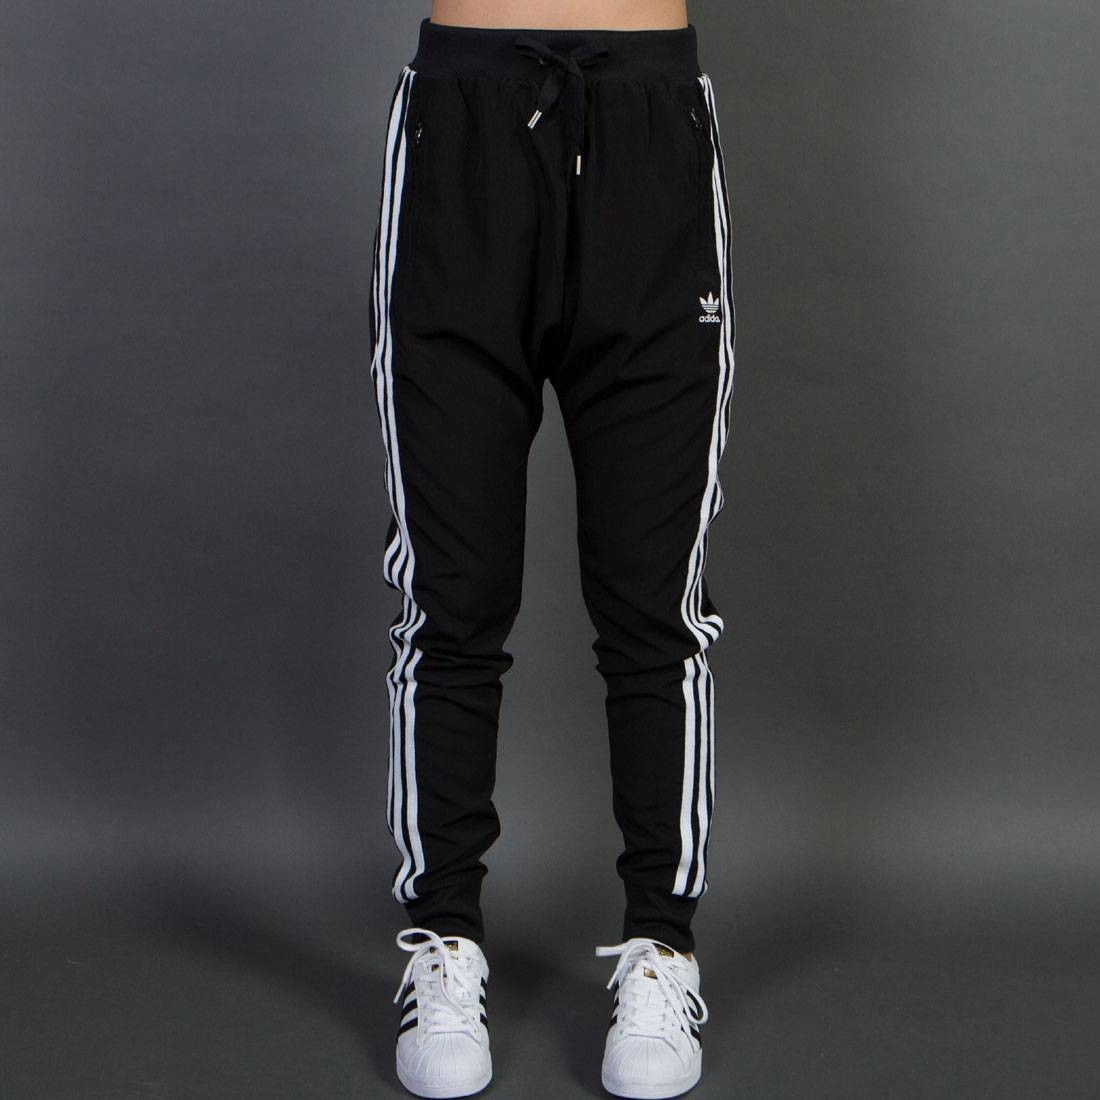 Adidas Women Drop Crotch Pants black 7b793ad28